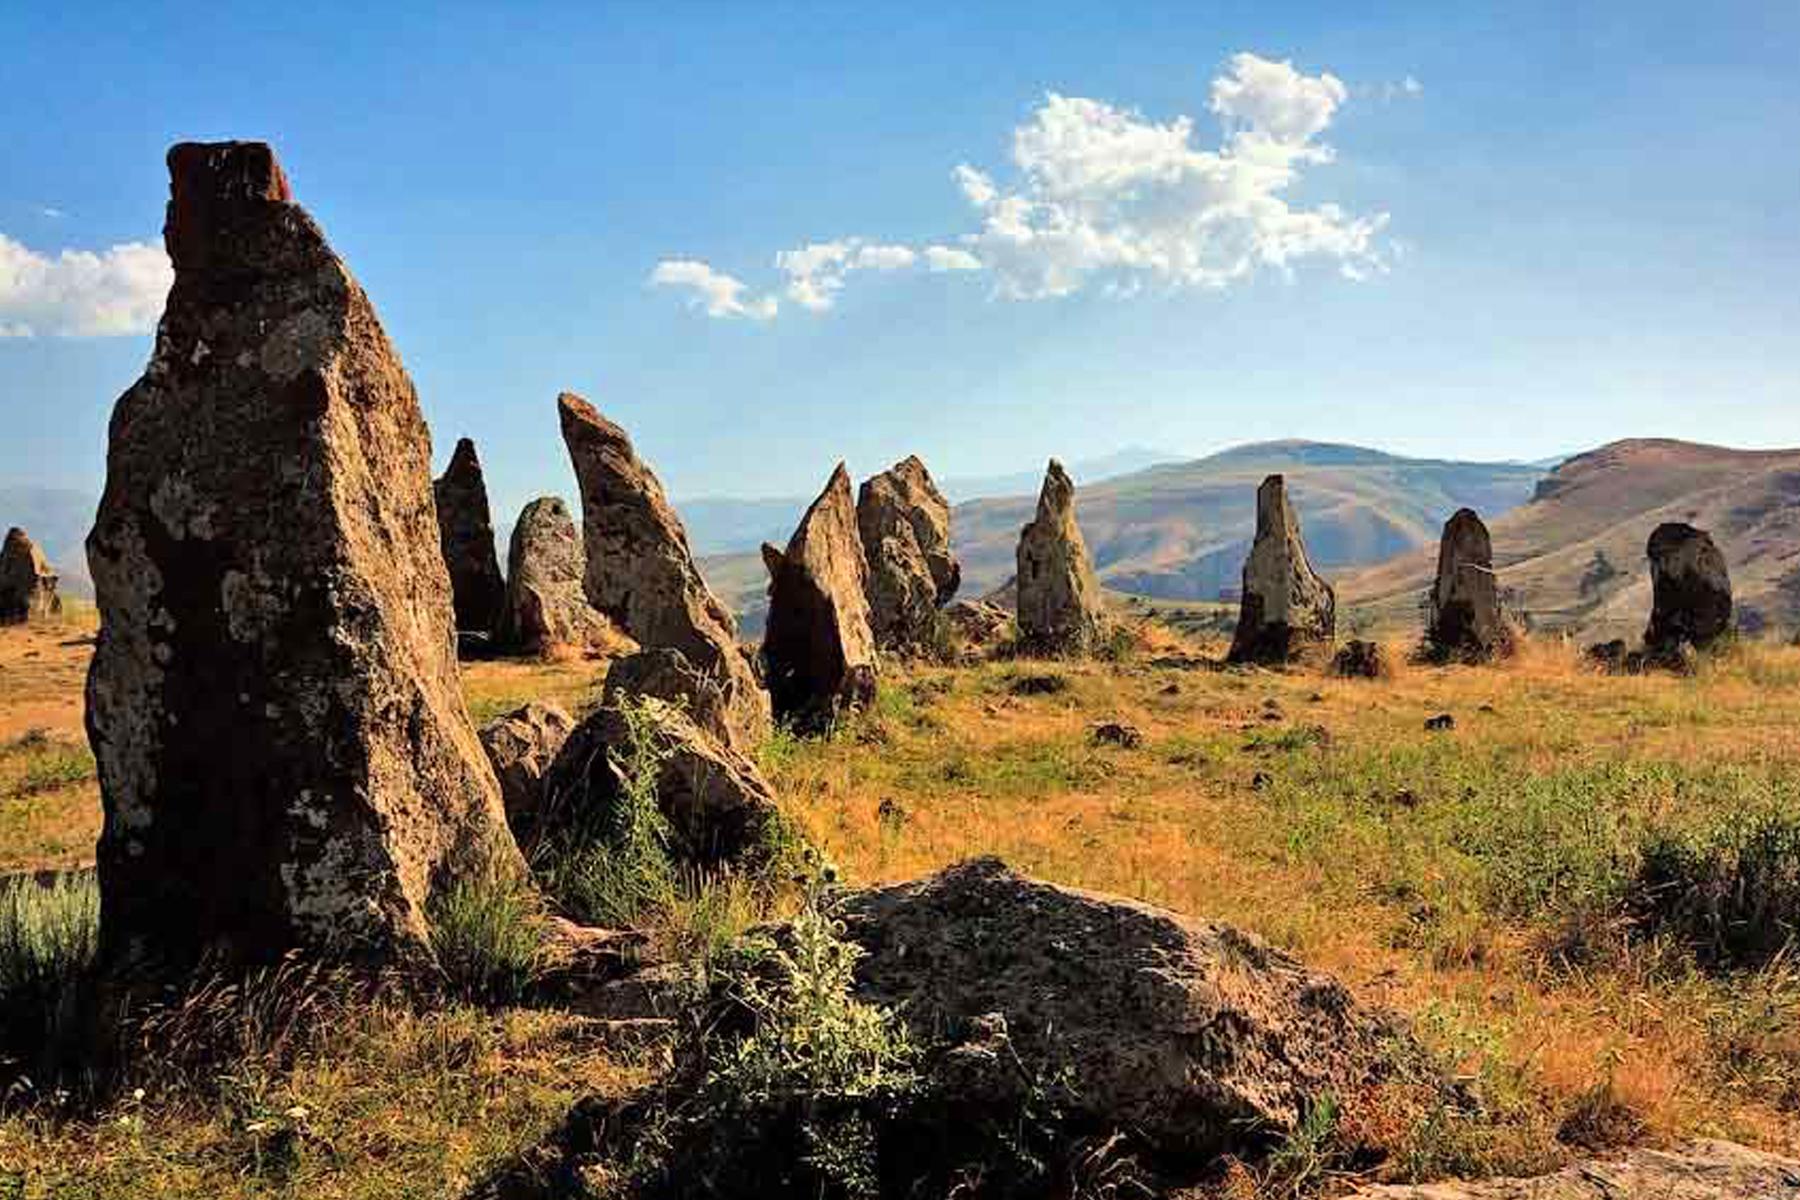 Karahunj Travel to Armenia